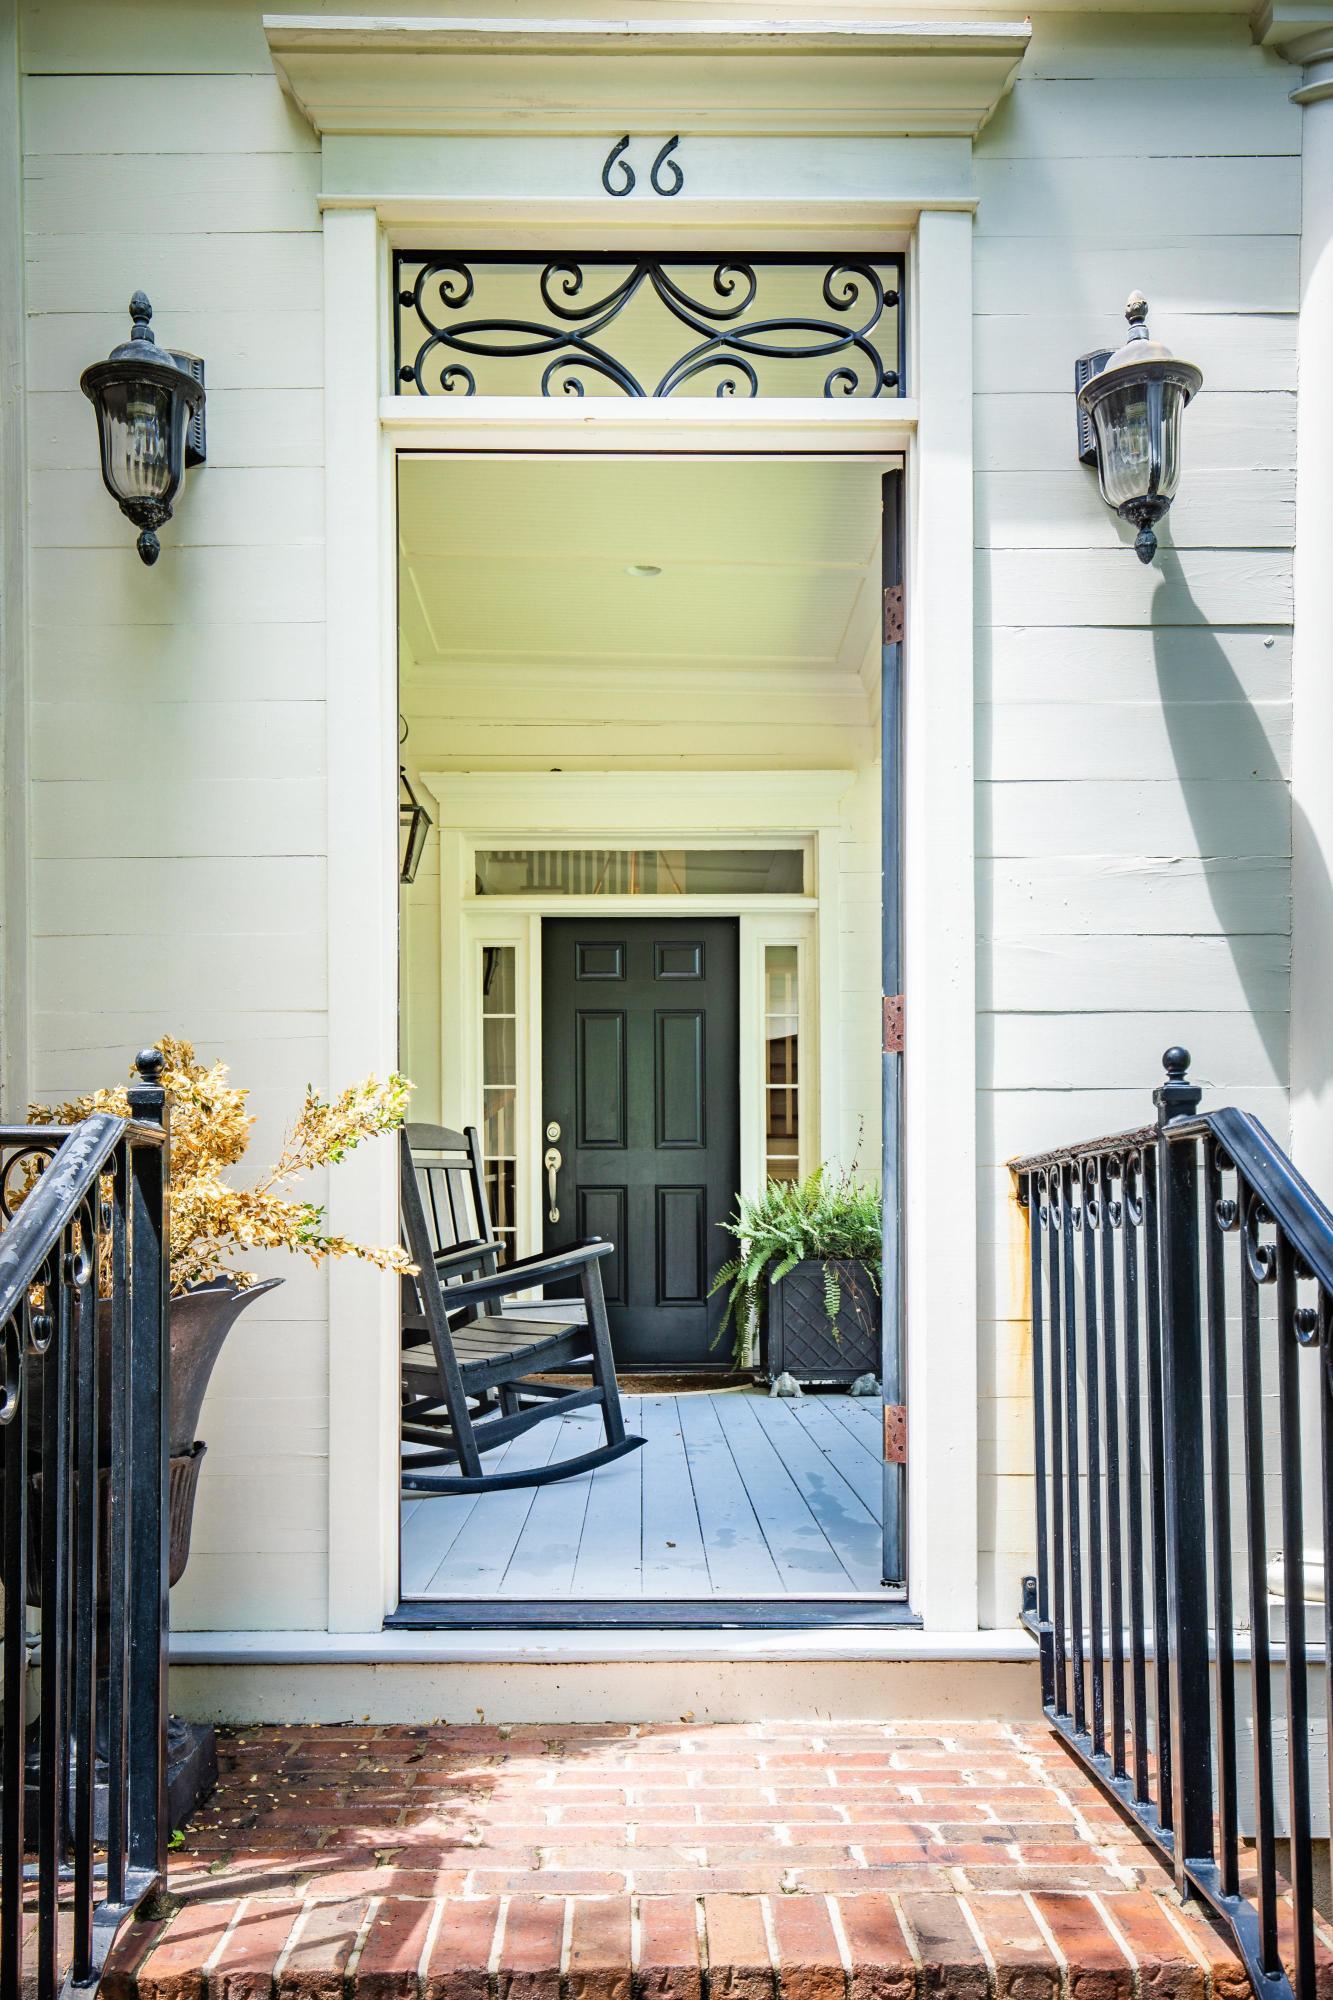 66 Dalton Street Charleston, SC 29492